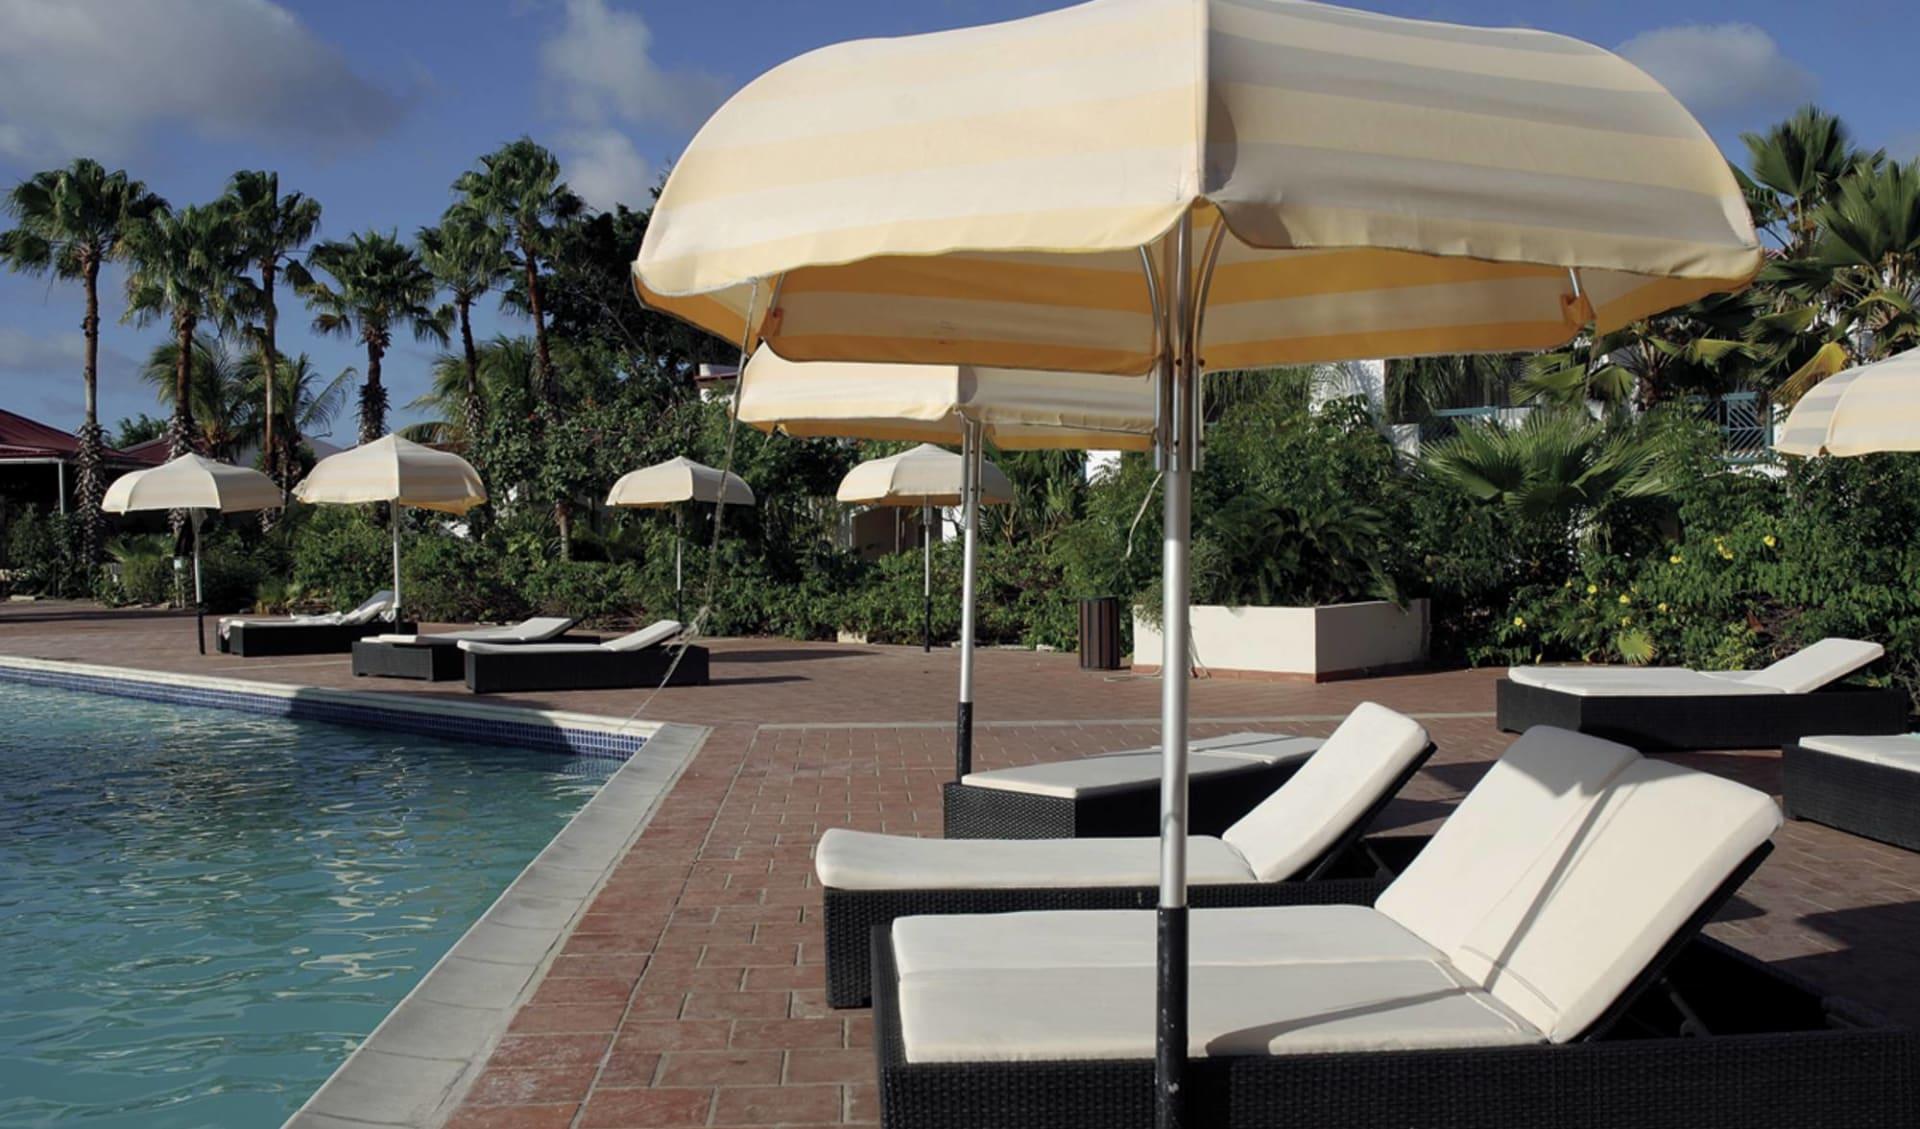 Plaza Resort Bonaire: pool plaza resort bonaire pool lounge